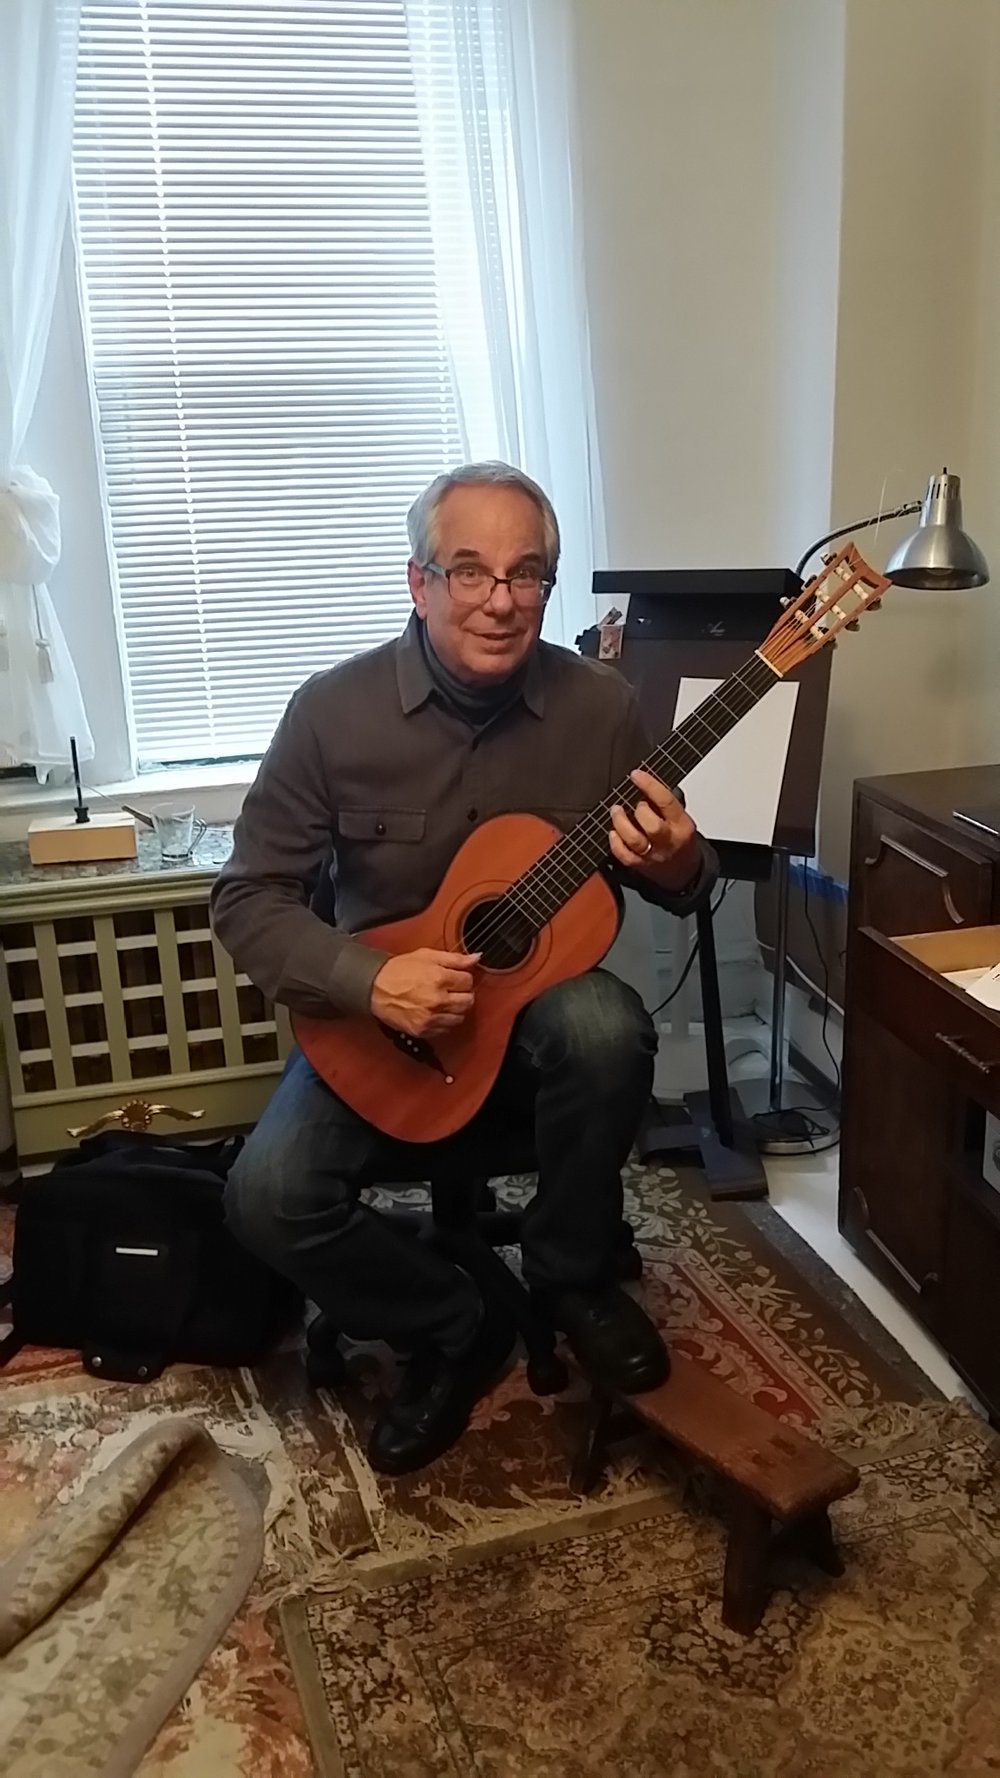 Jerry Willard's 19th Century Guitar